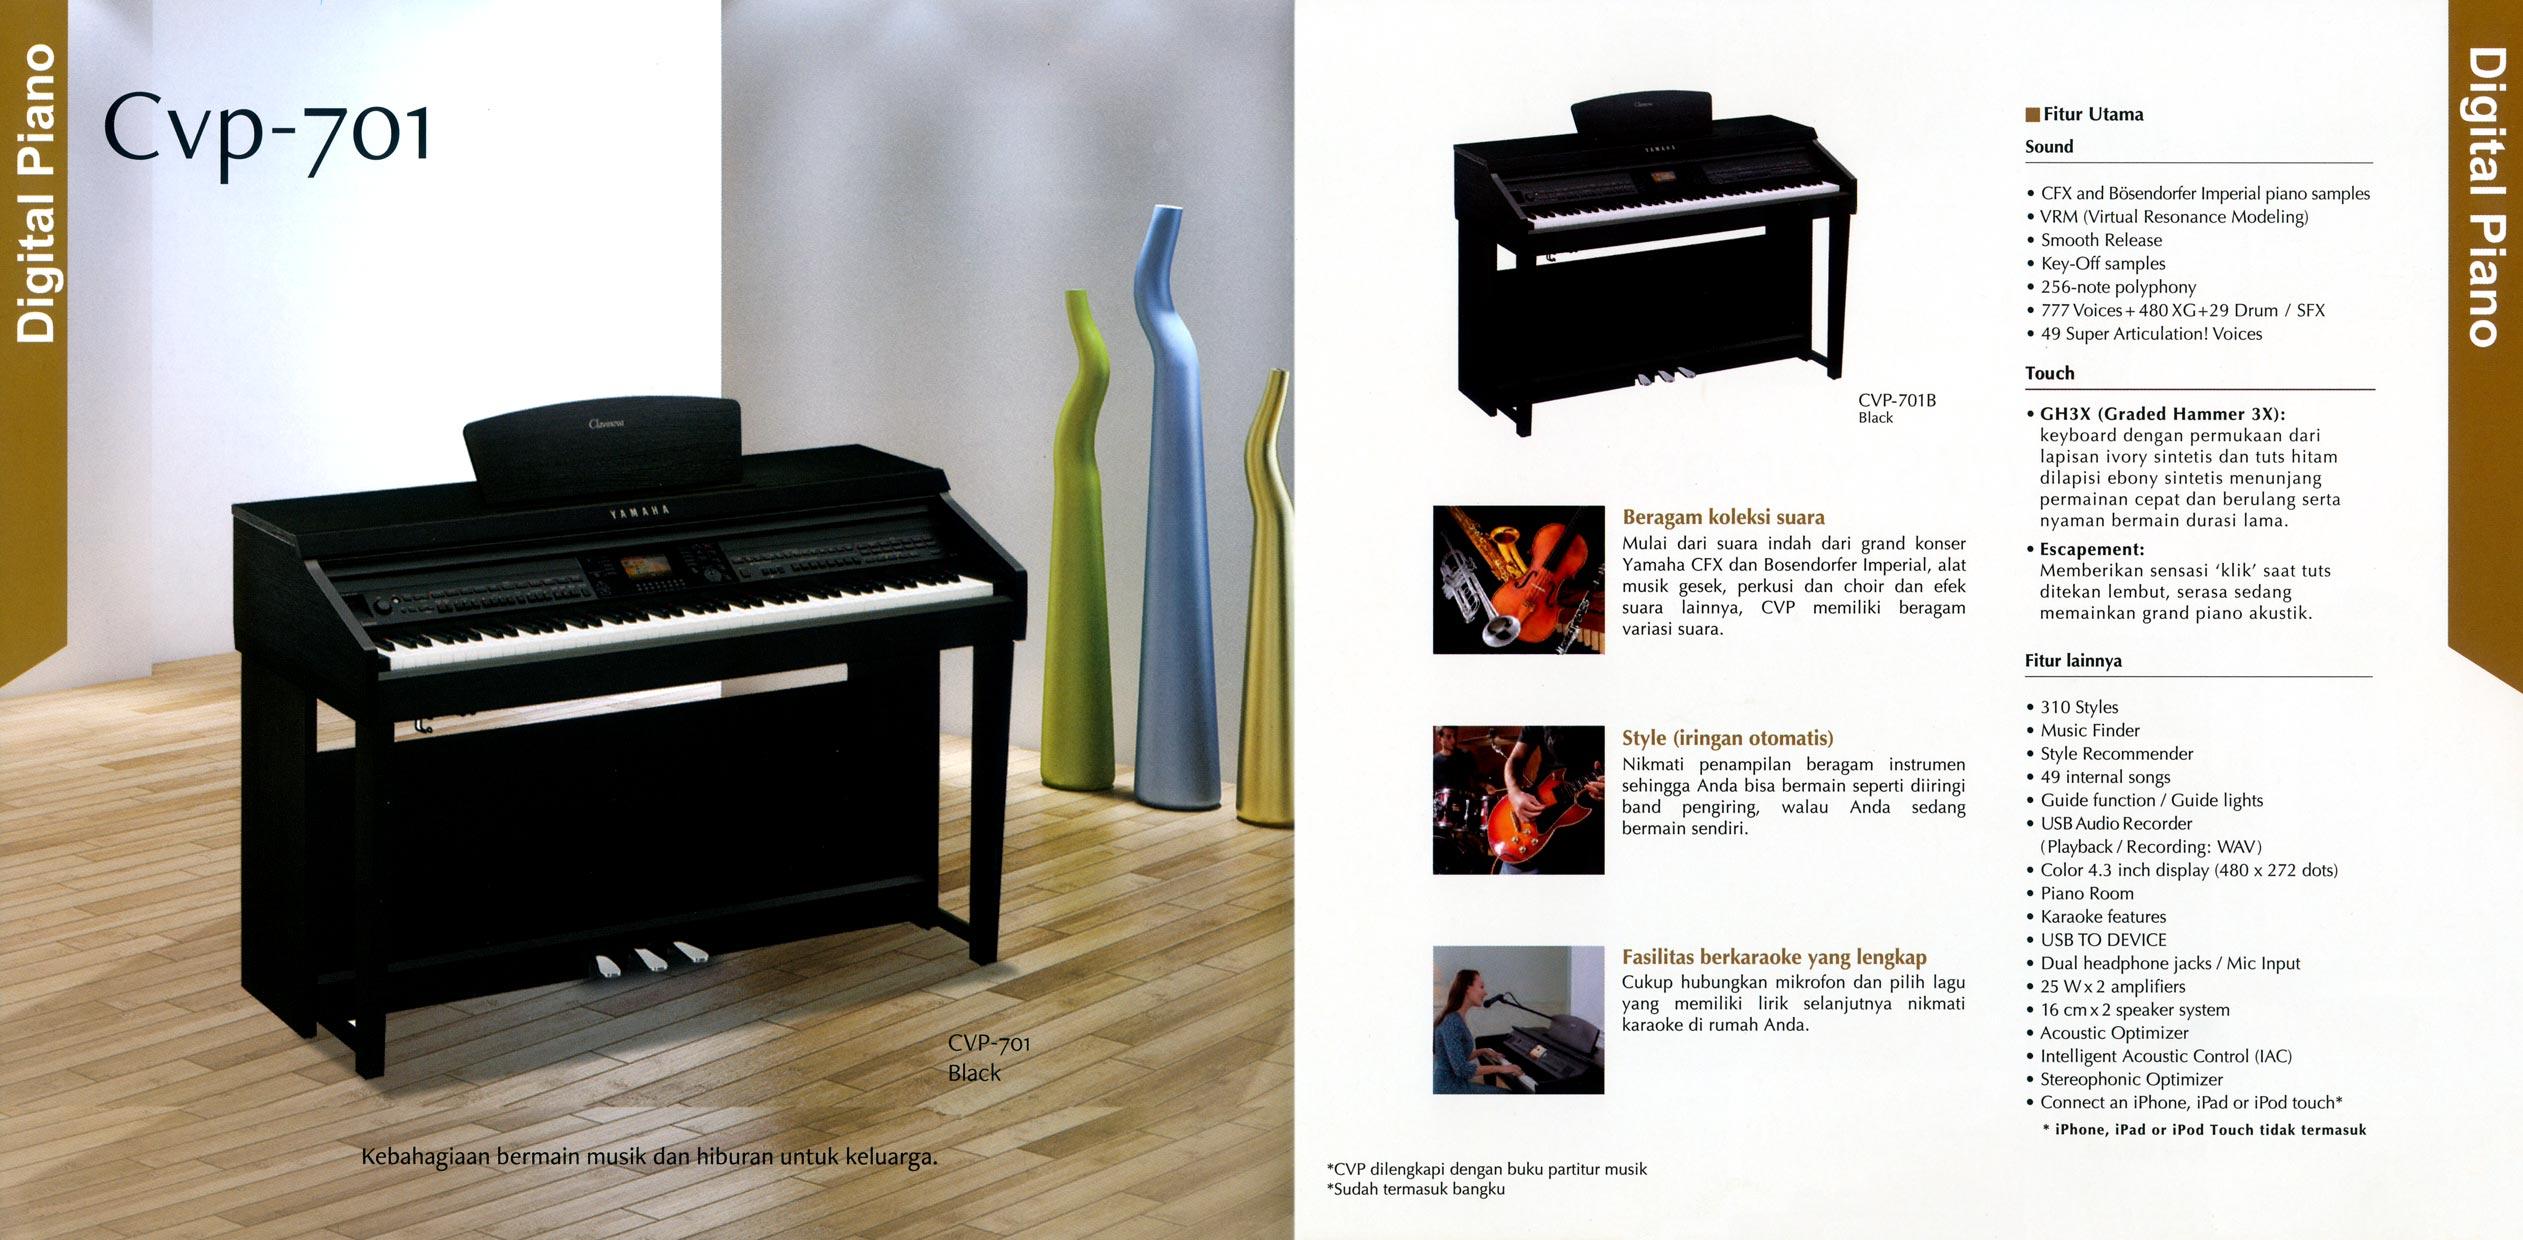 clavinova cvp 701. Black Bedroom Furniture Sets. Home Design Ideas